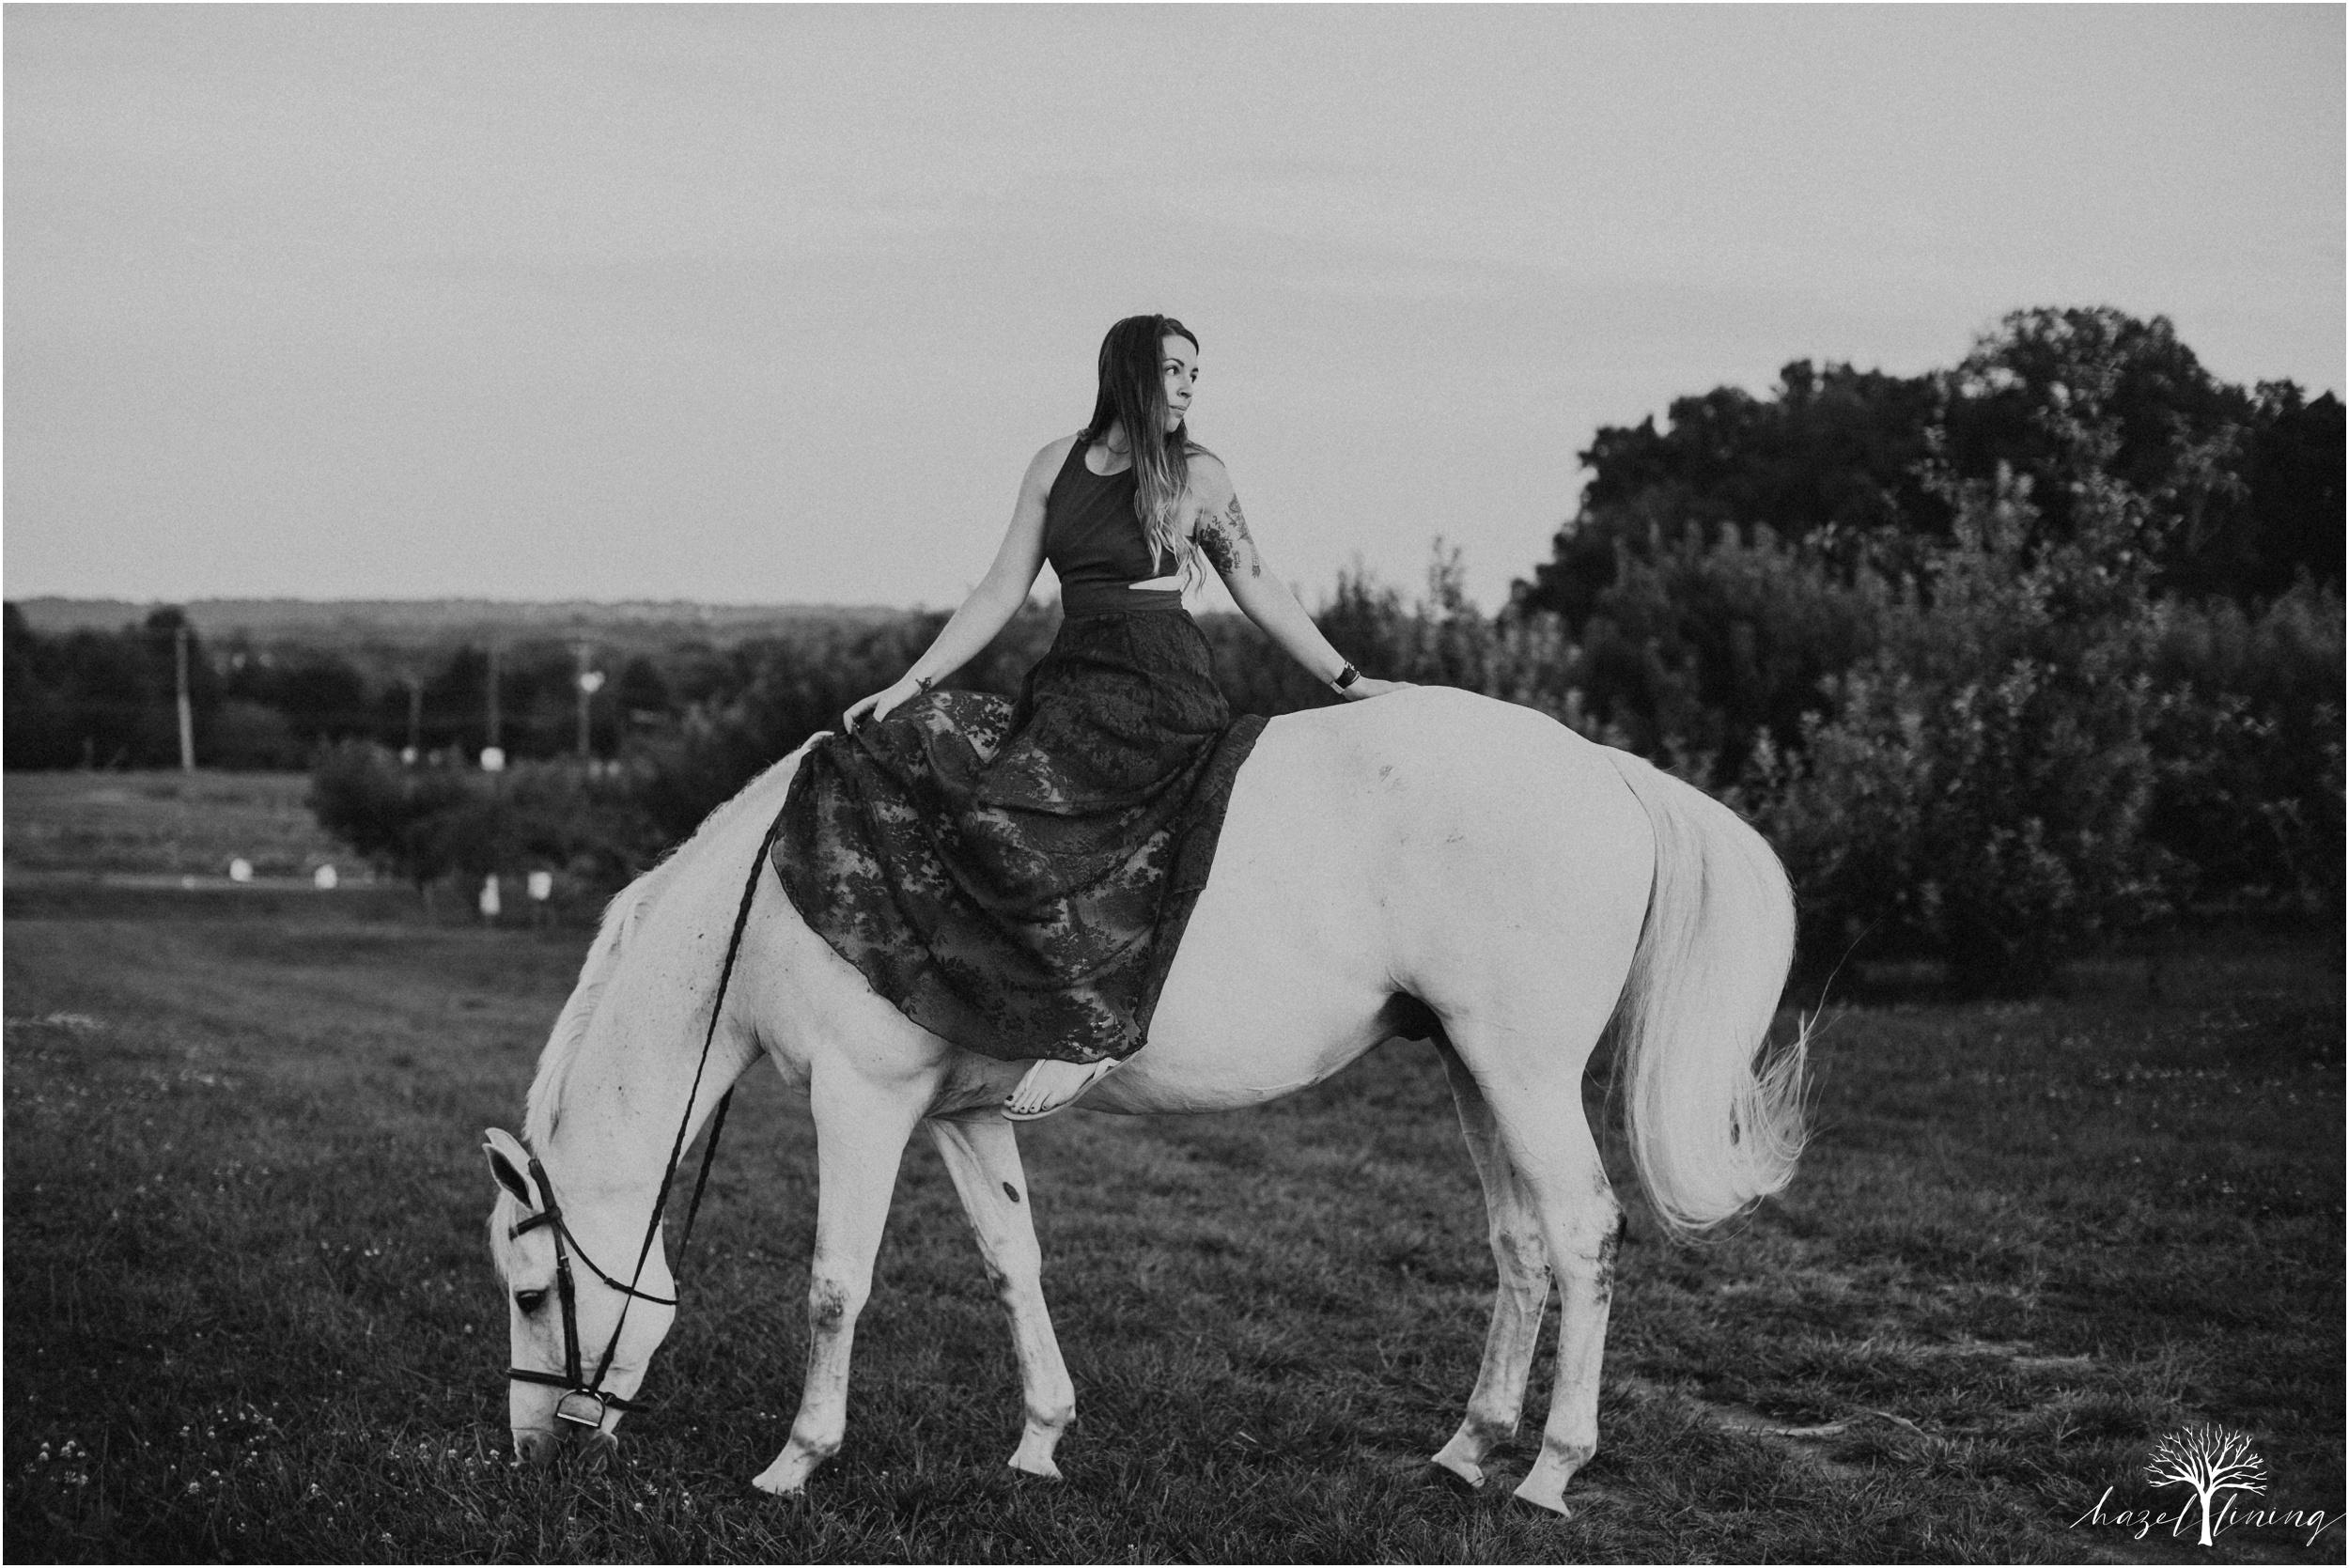 taylor-adams-and-horse-delaware-valley-university-delval-summer-equestrian-portrait-session-hazel-lining-photography-destination-elopement-wedding-engagement-photography_0050.jpg